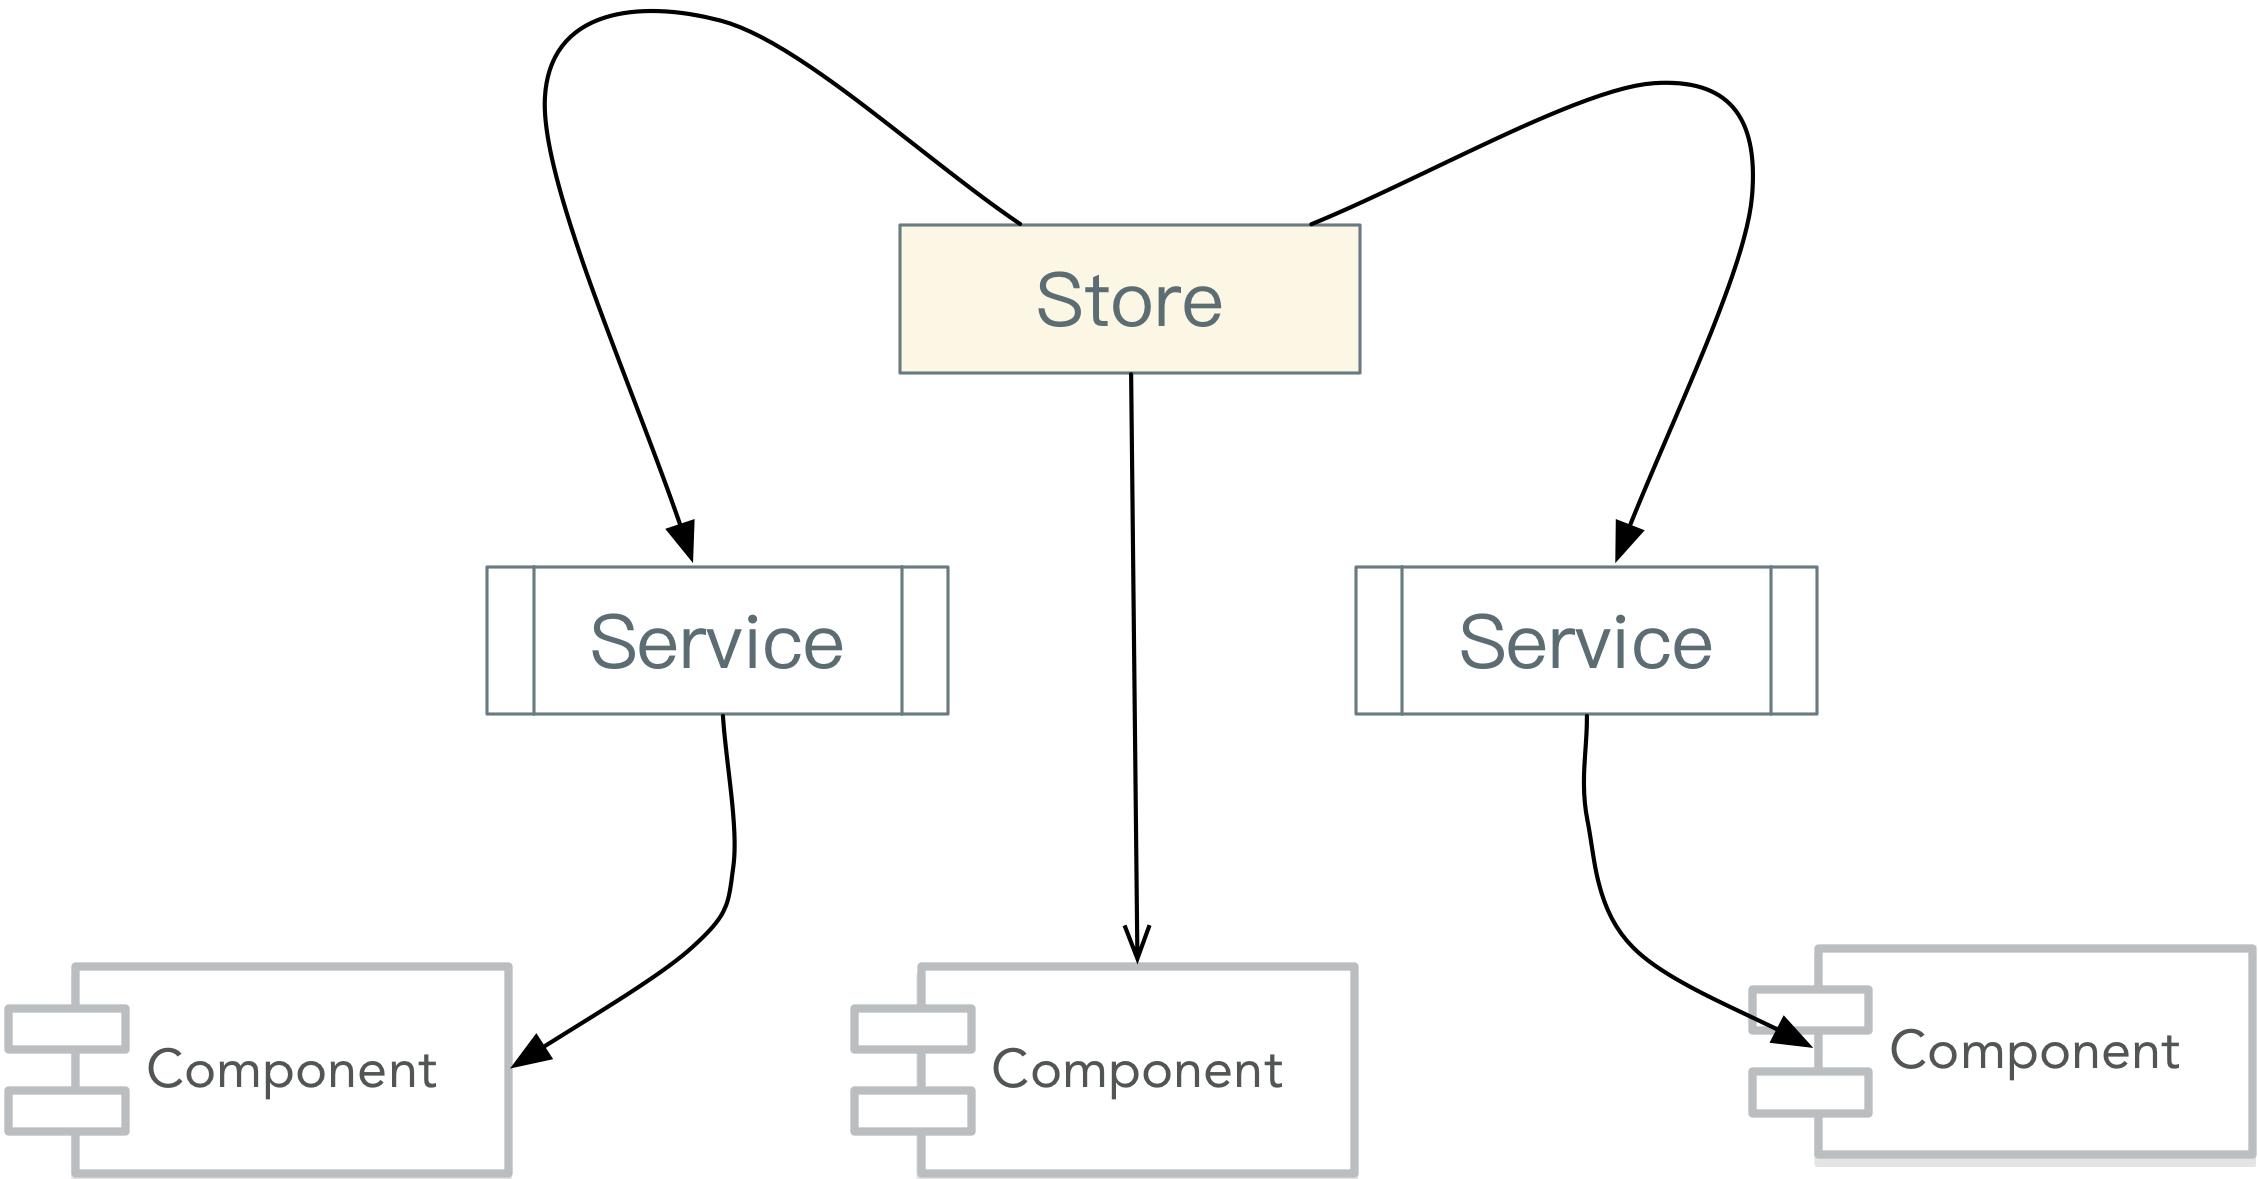 Store即可以在Service中使用也可以在Component中使用